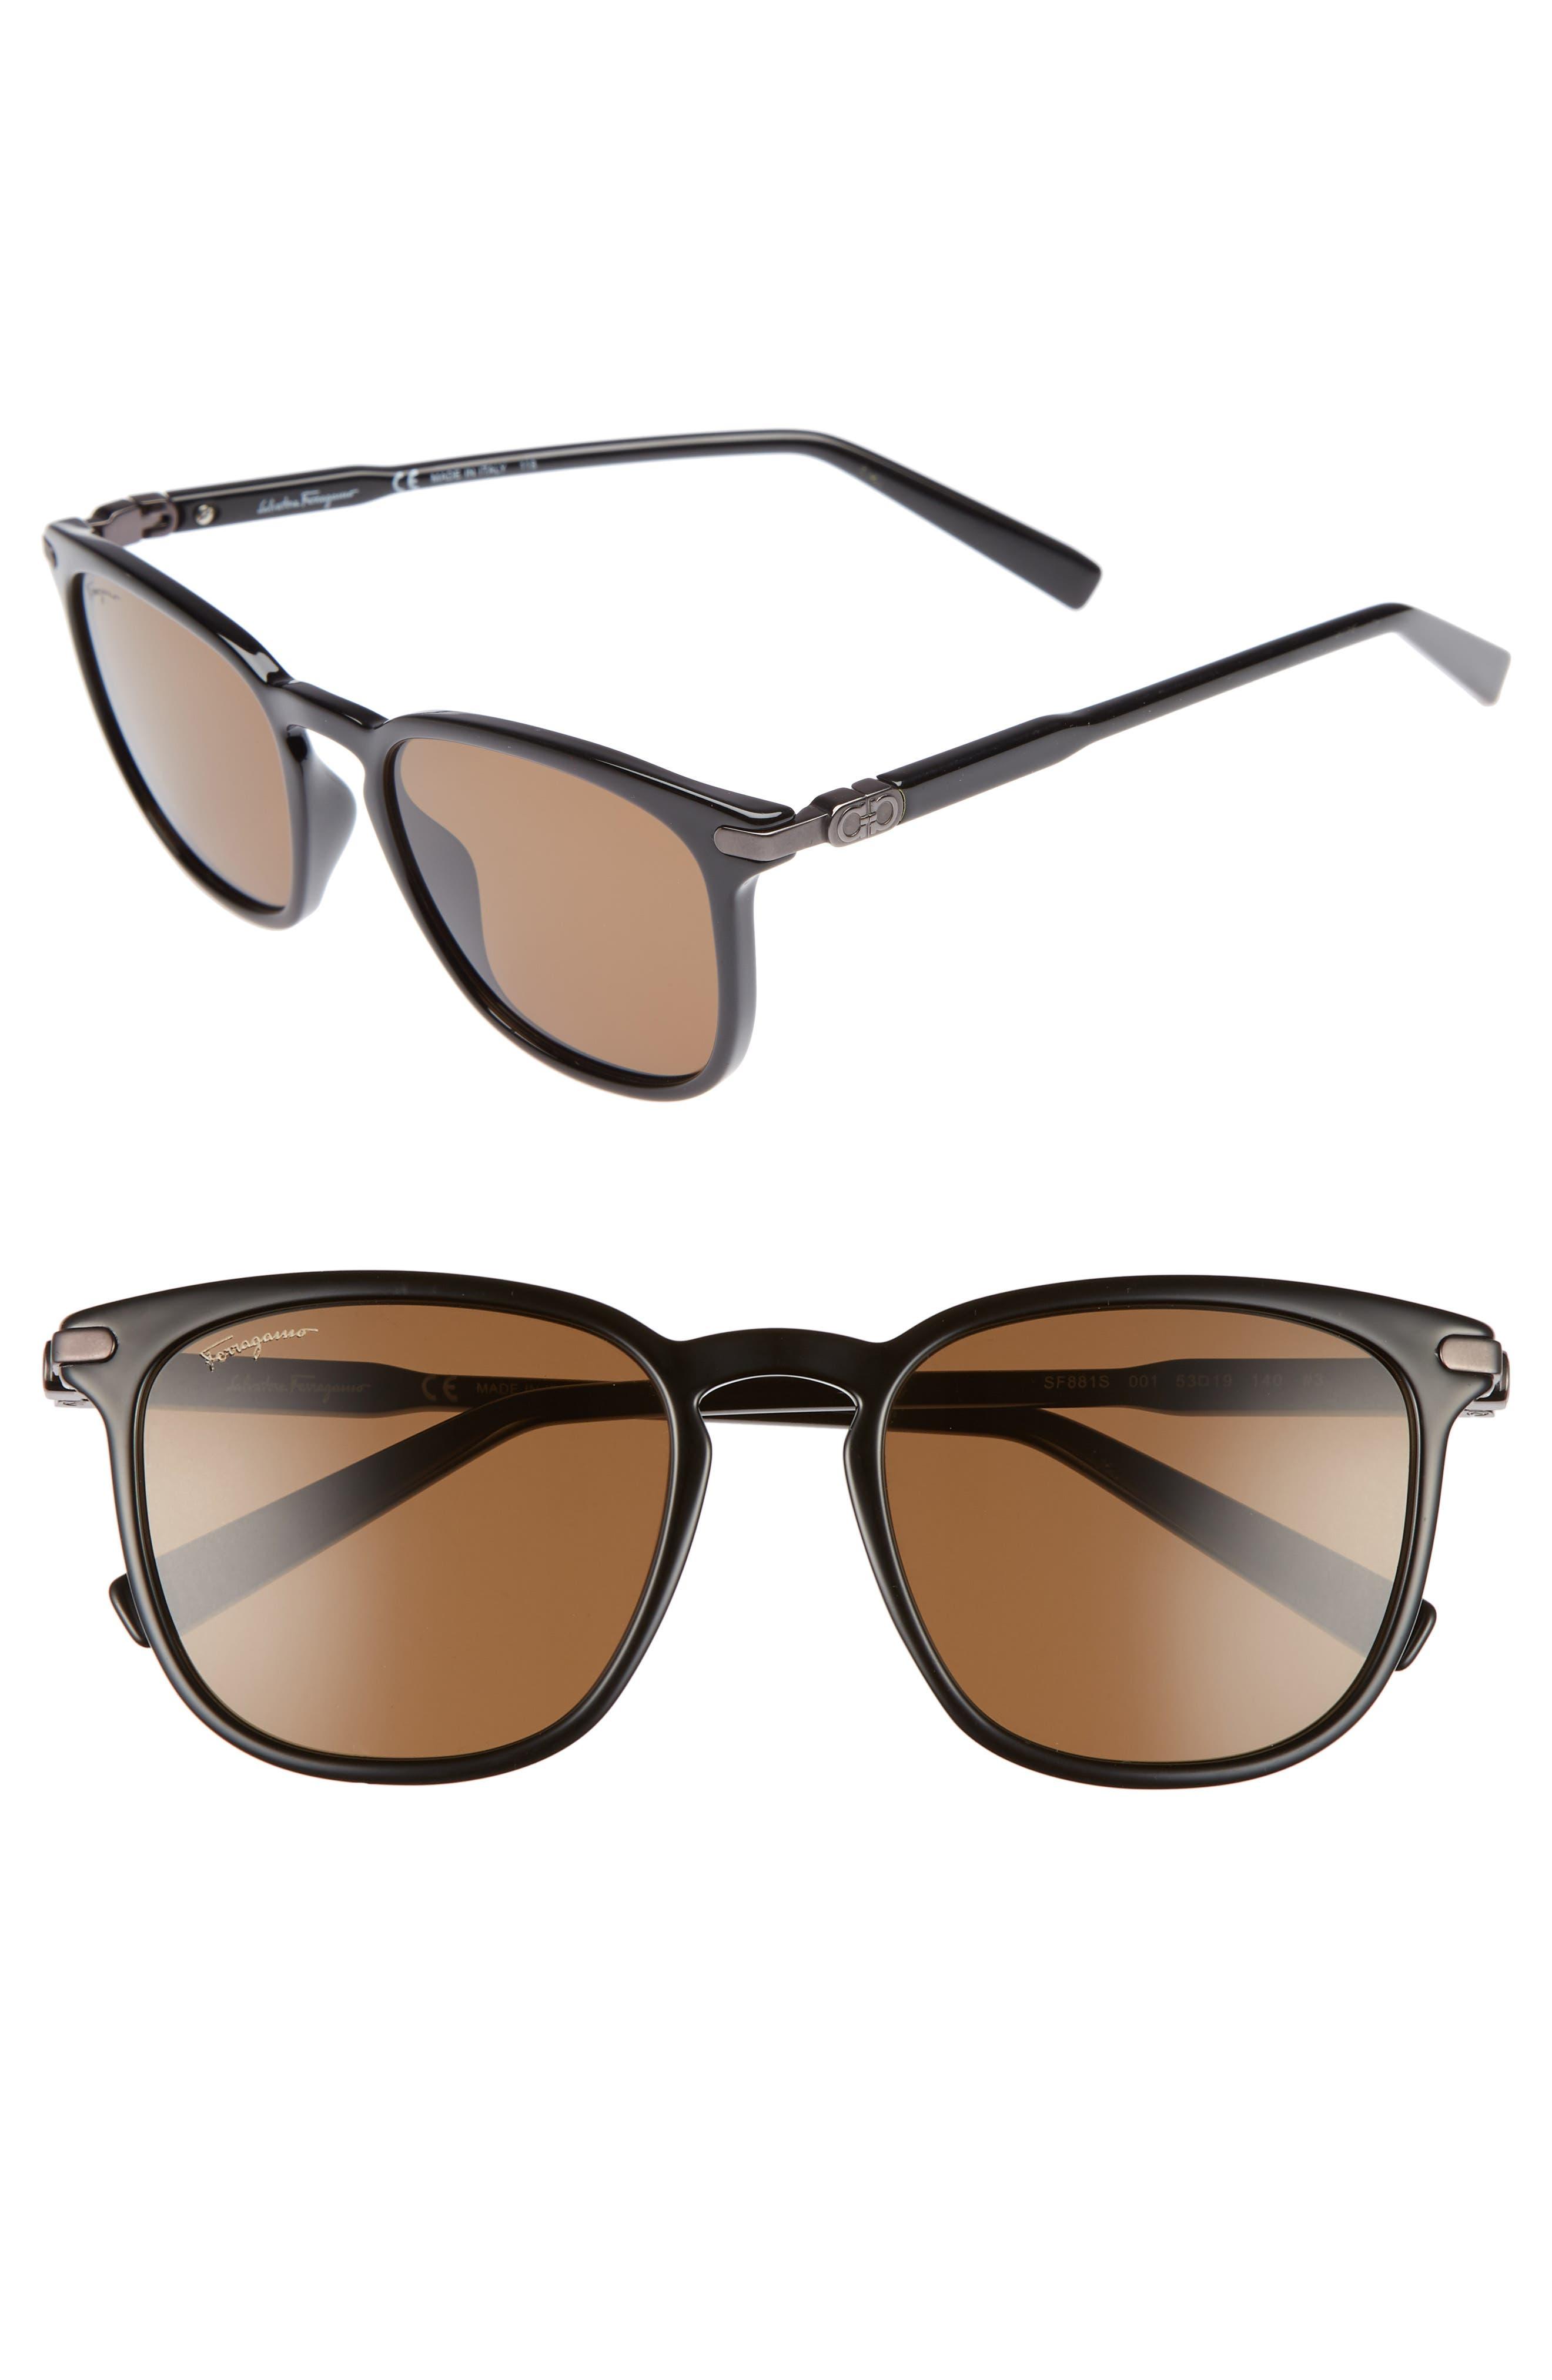 Double Gancio 53mm Sunglasses,                             Main thumbnail 1, color,                             BLACK